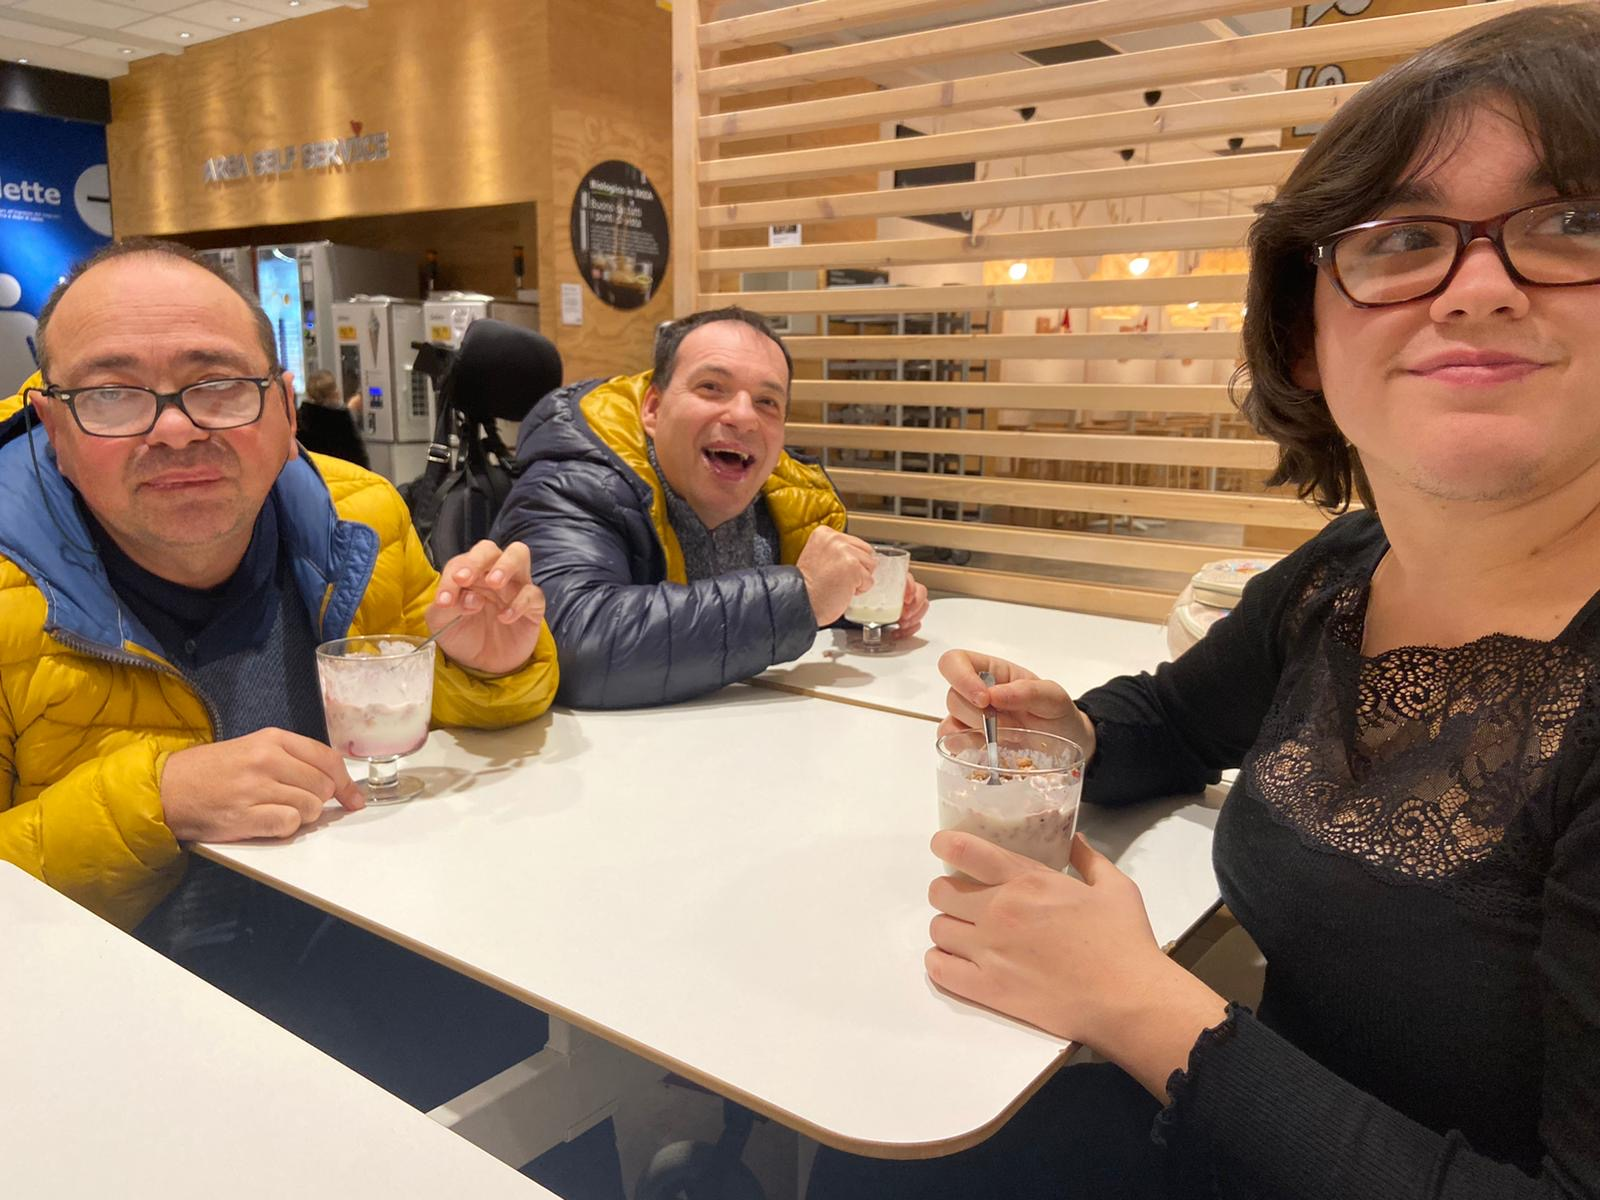 Esco di Casa: foto di Elisa, Luca e Dario